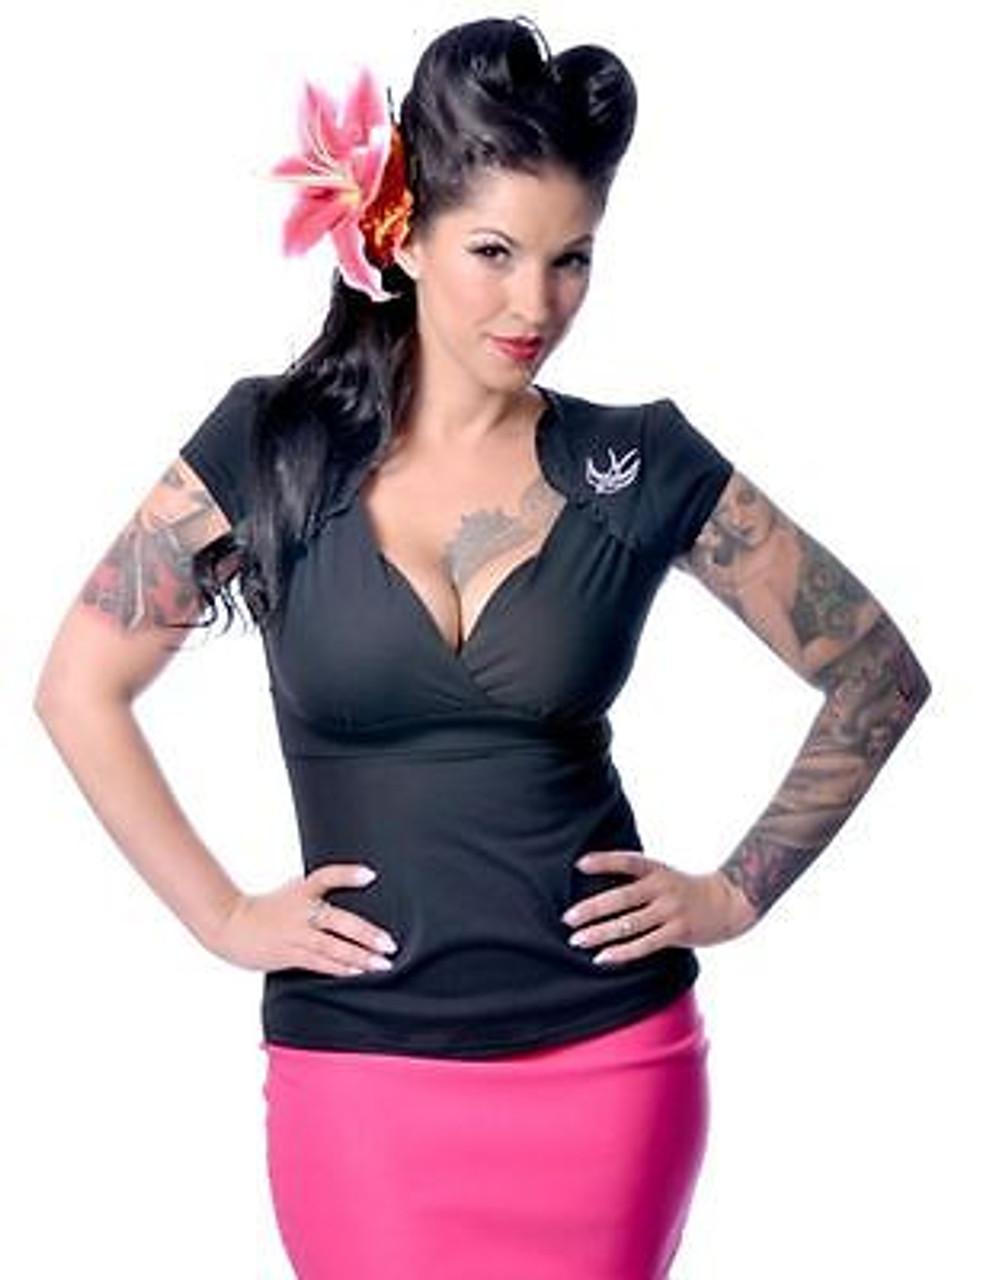 Steady Peasant Top Red Goth Punk Rocker Pin Up Fancy Rockabilly Shirt S-2Xl